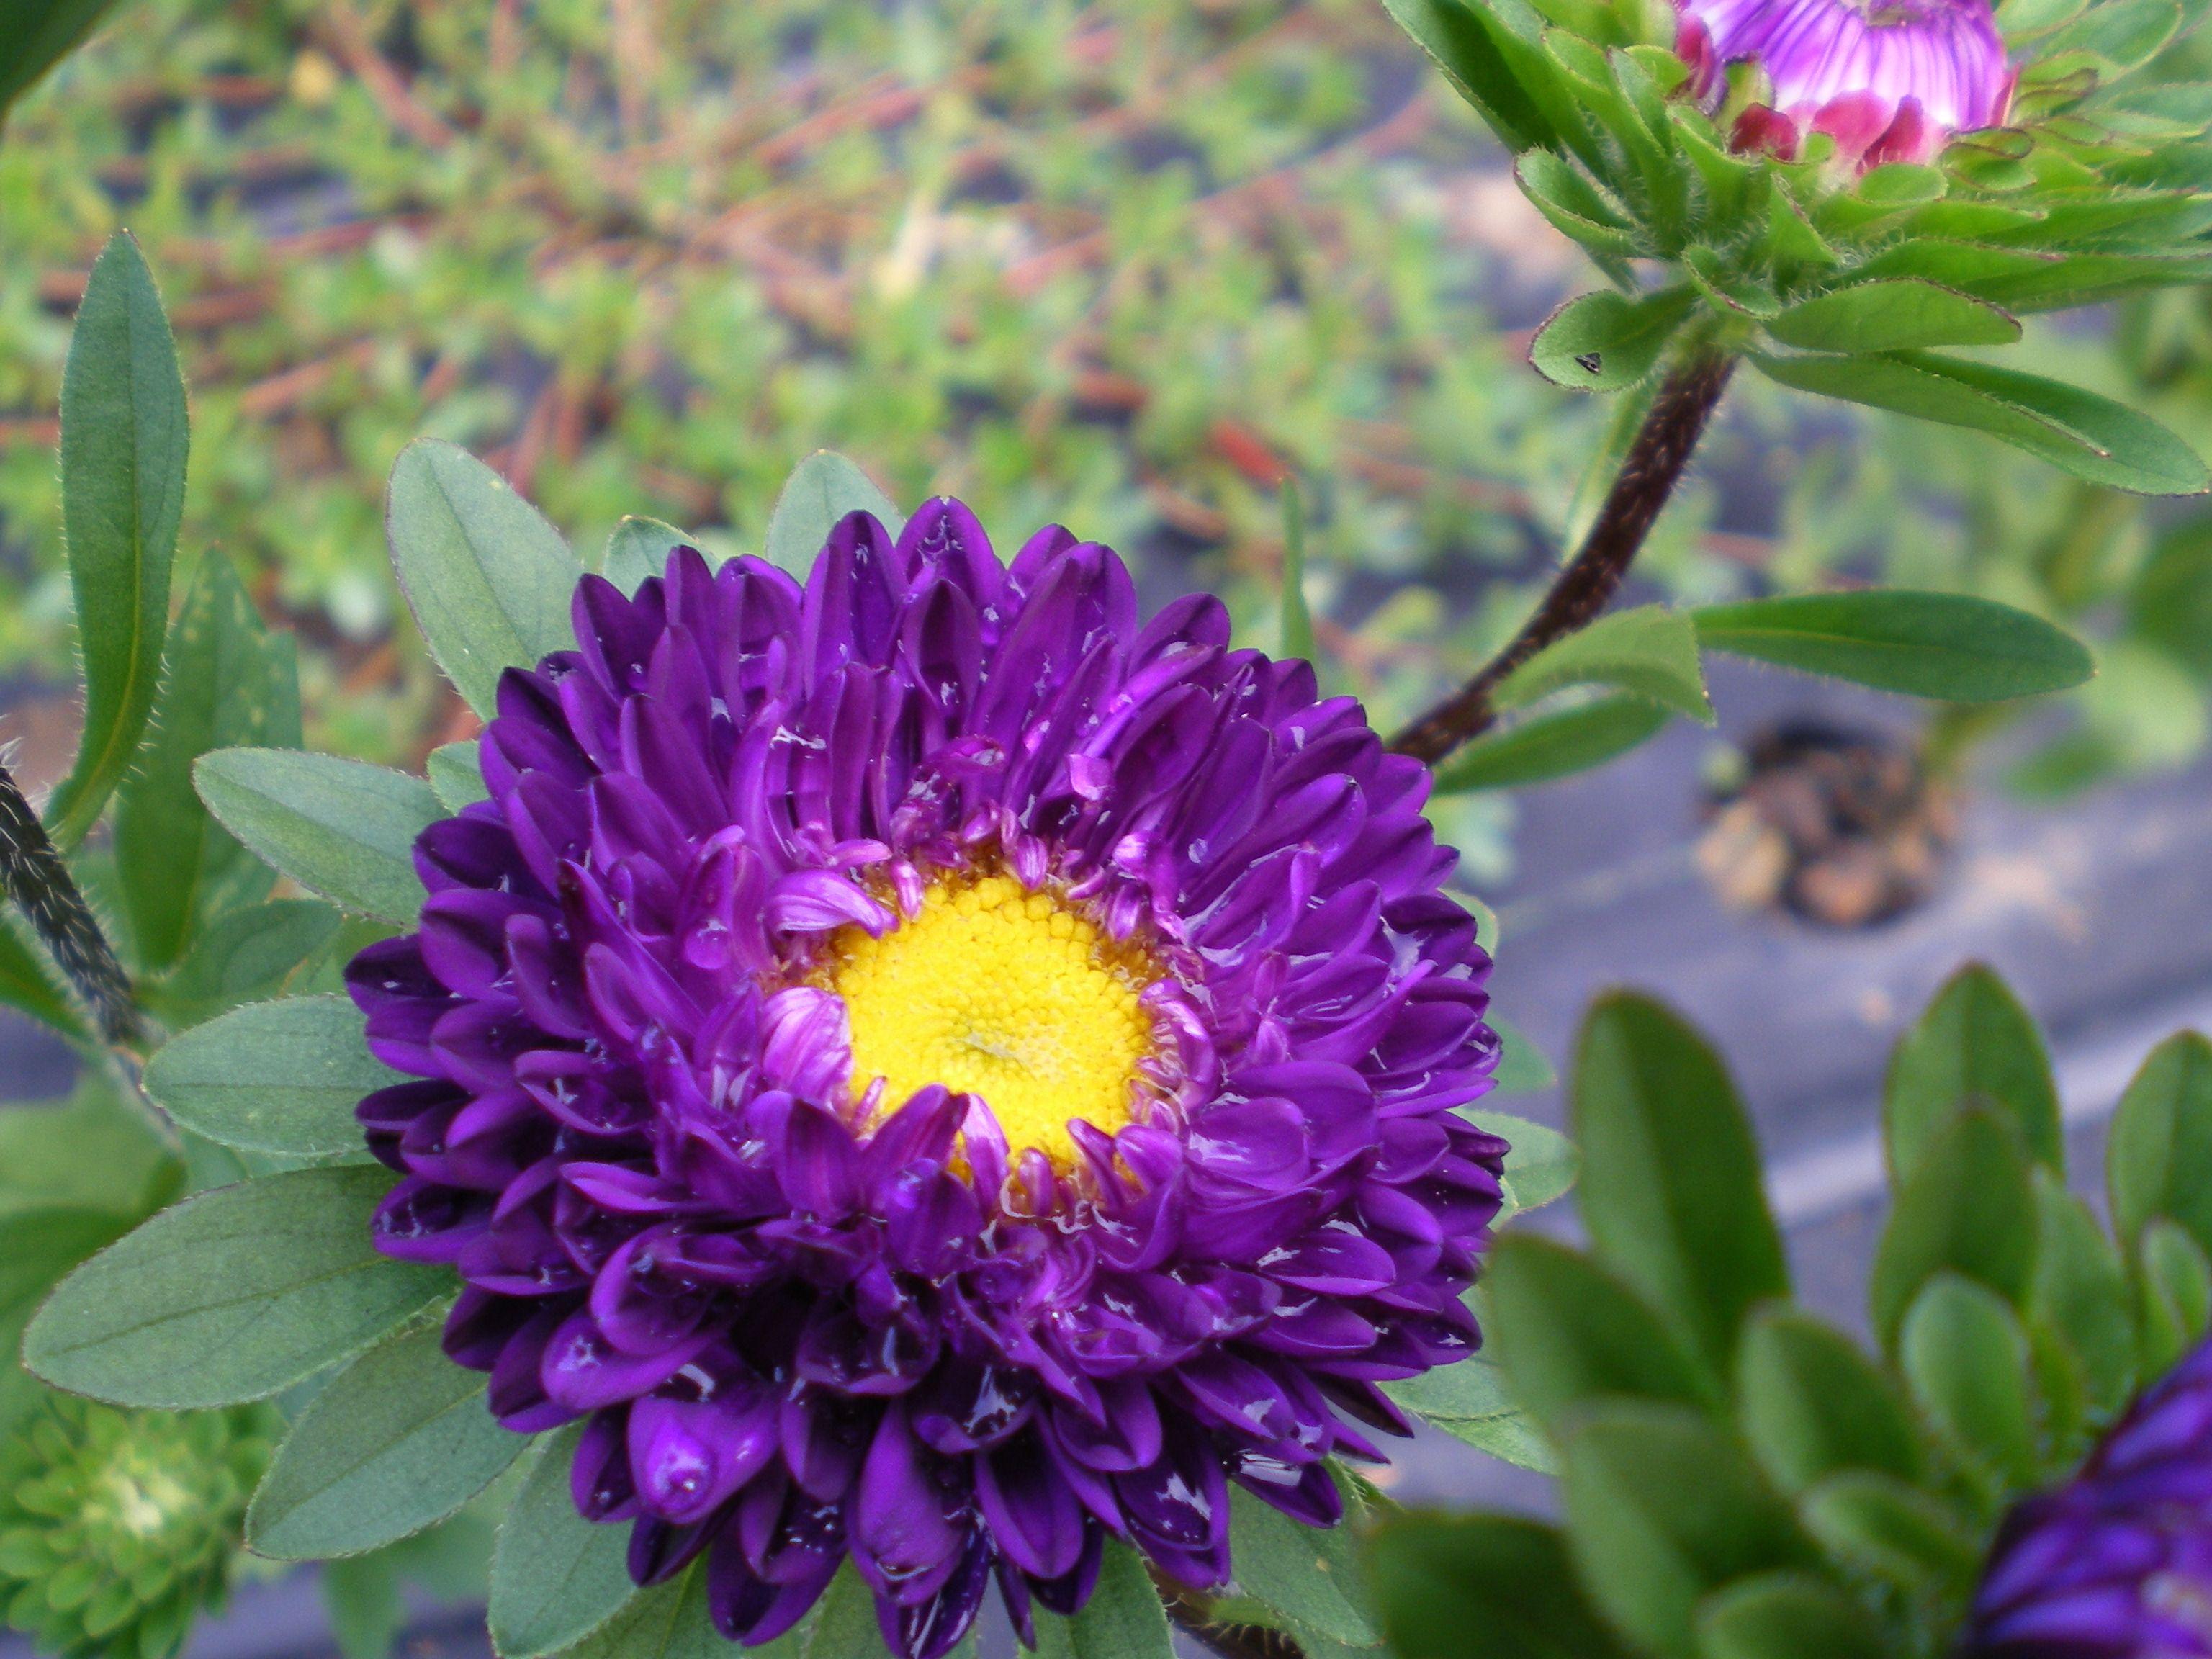 Purple Aster China Aster Flower Farm Beautiful Flowers Purple Floral